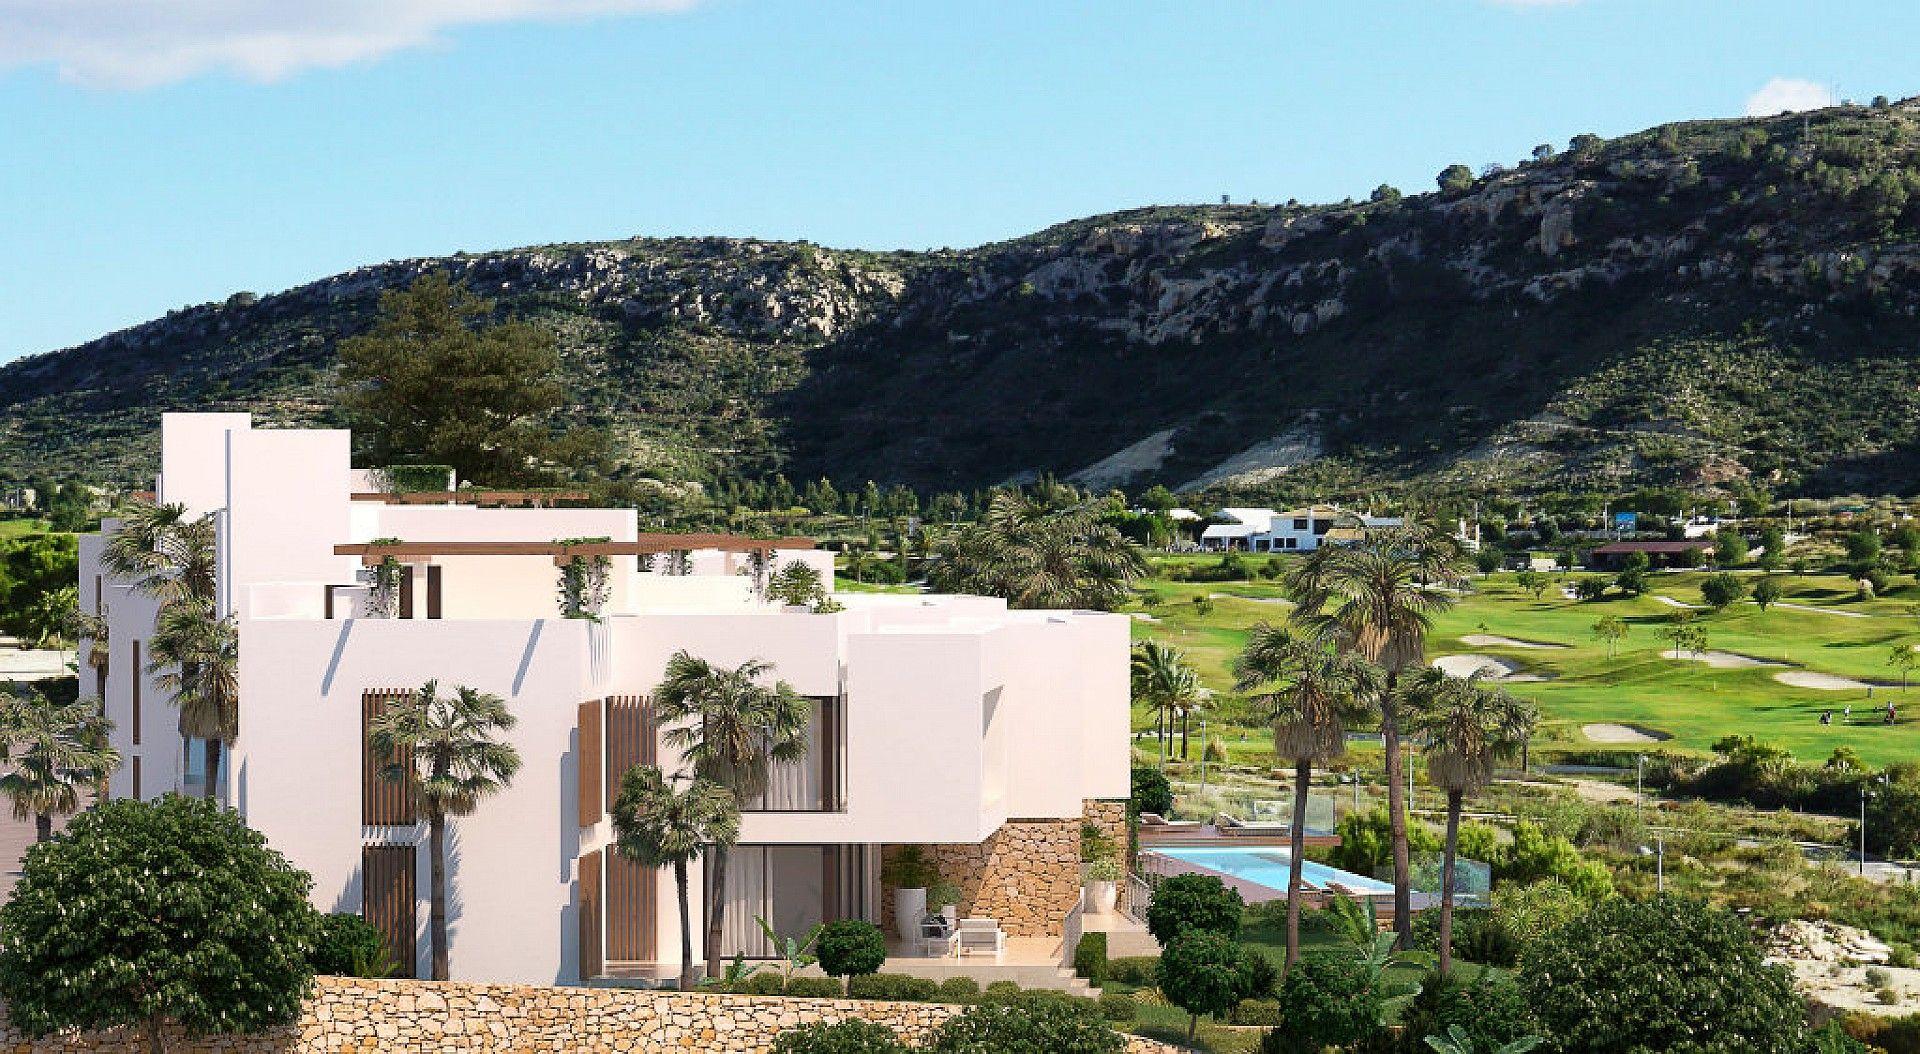 w_golf-alicante-appartement-te-koop-costa-blanca-spanje-014.jpg